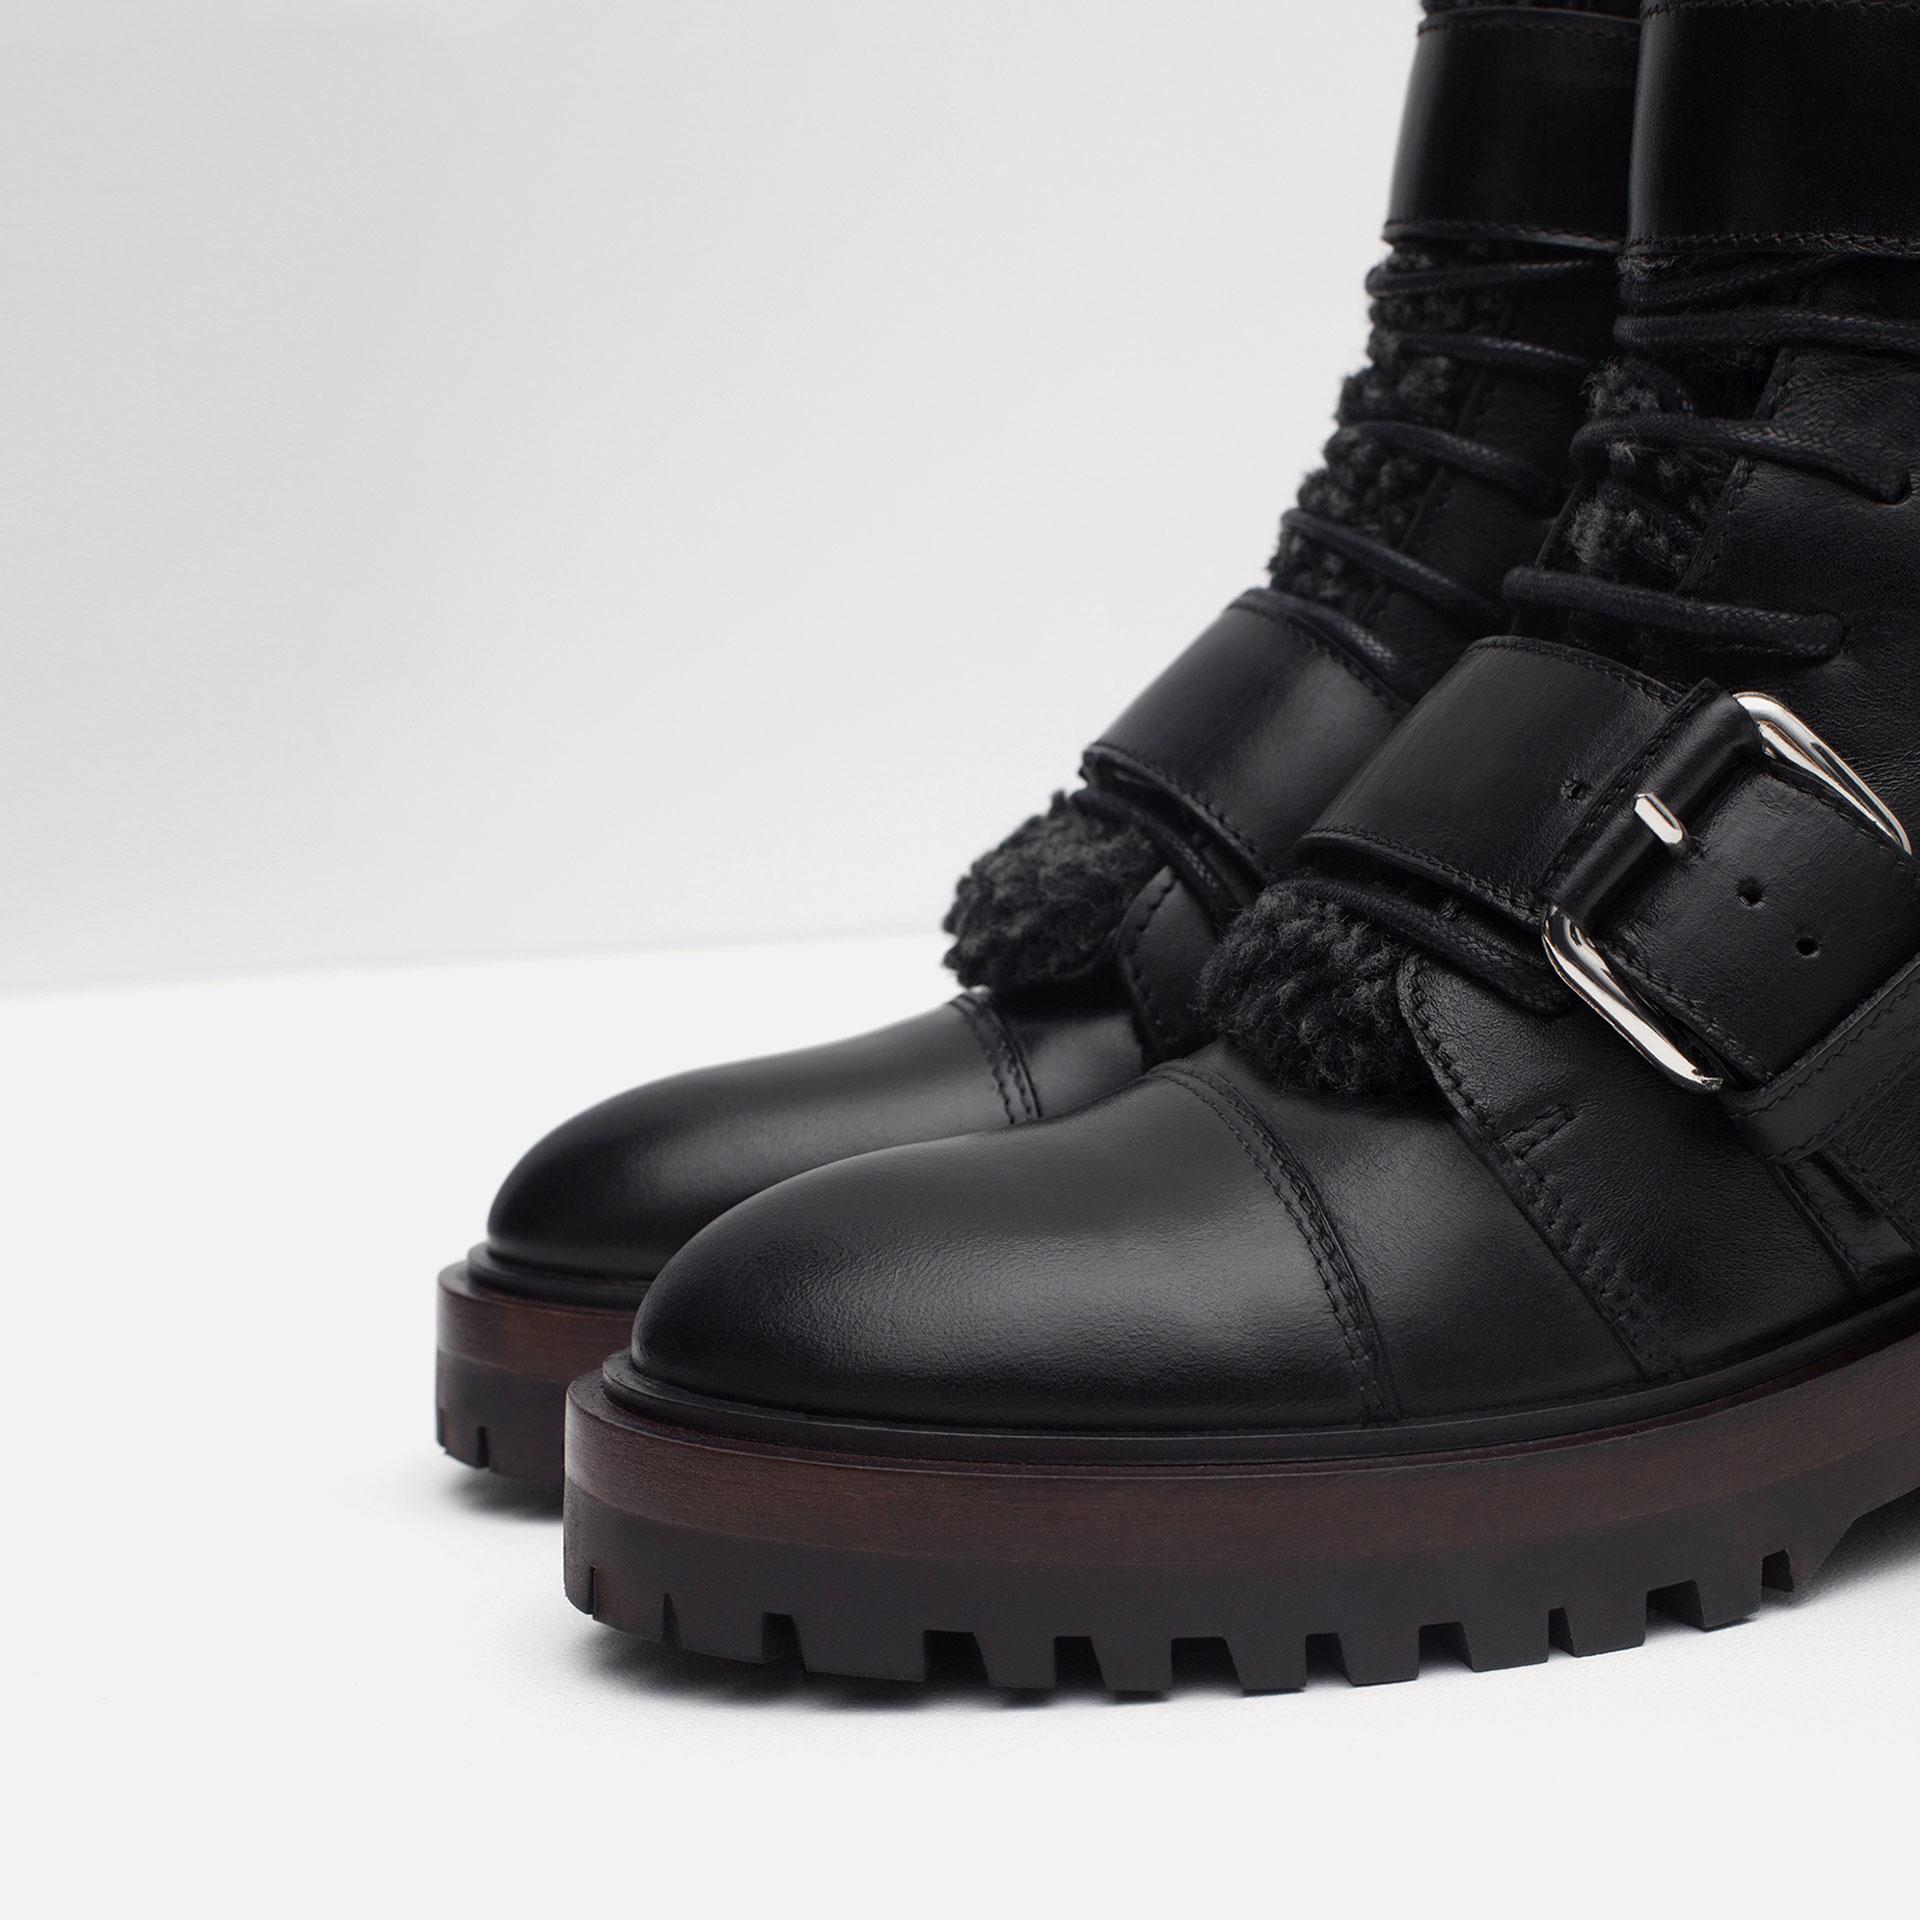 Creative   Women39s Boots  Fahrenheit Black Women39s Knee High Boots  Zara01